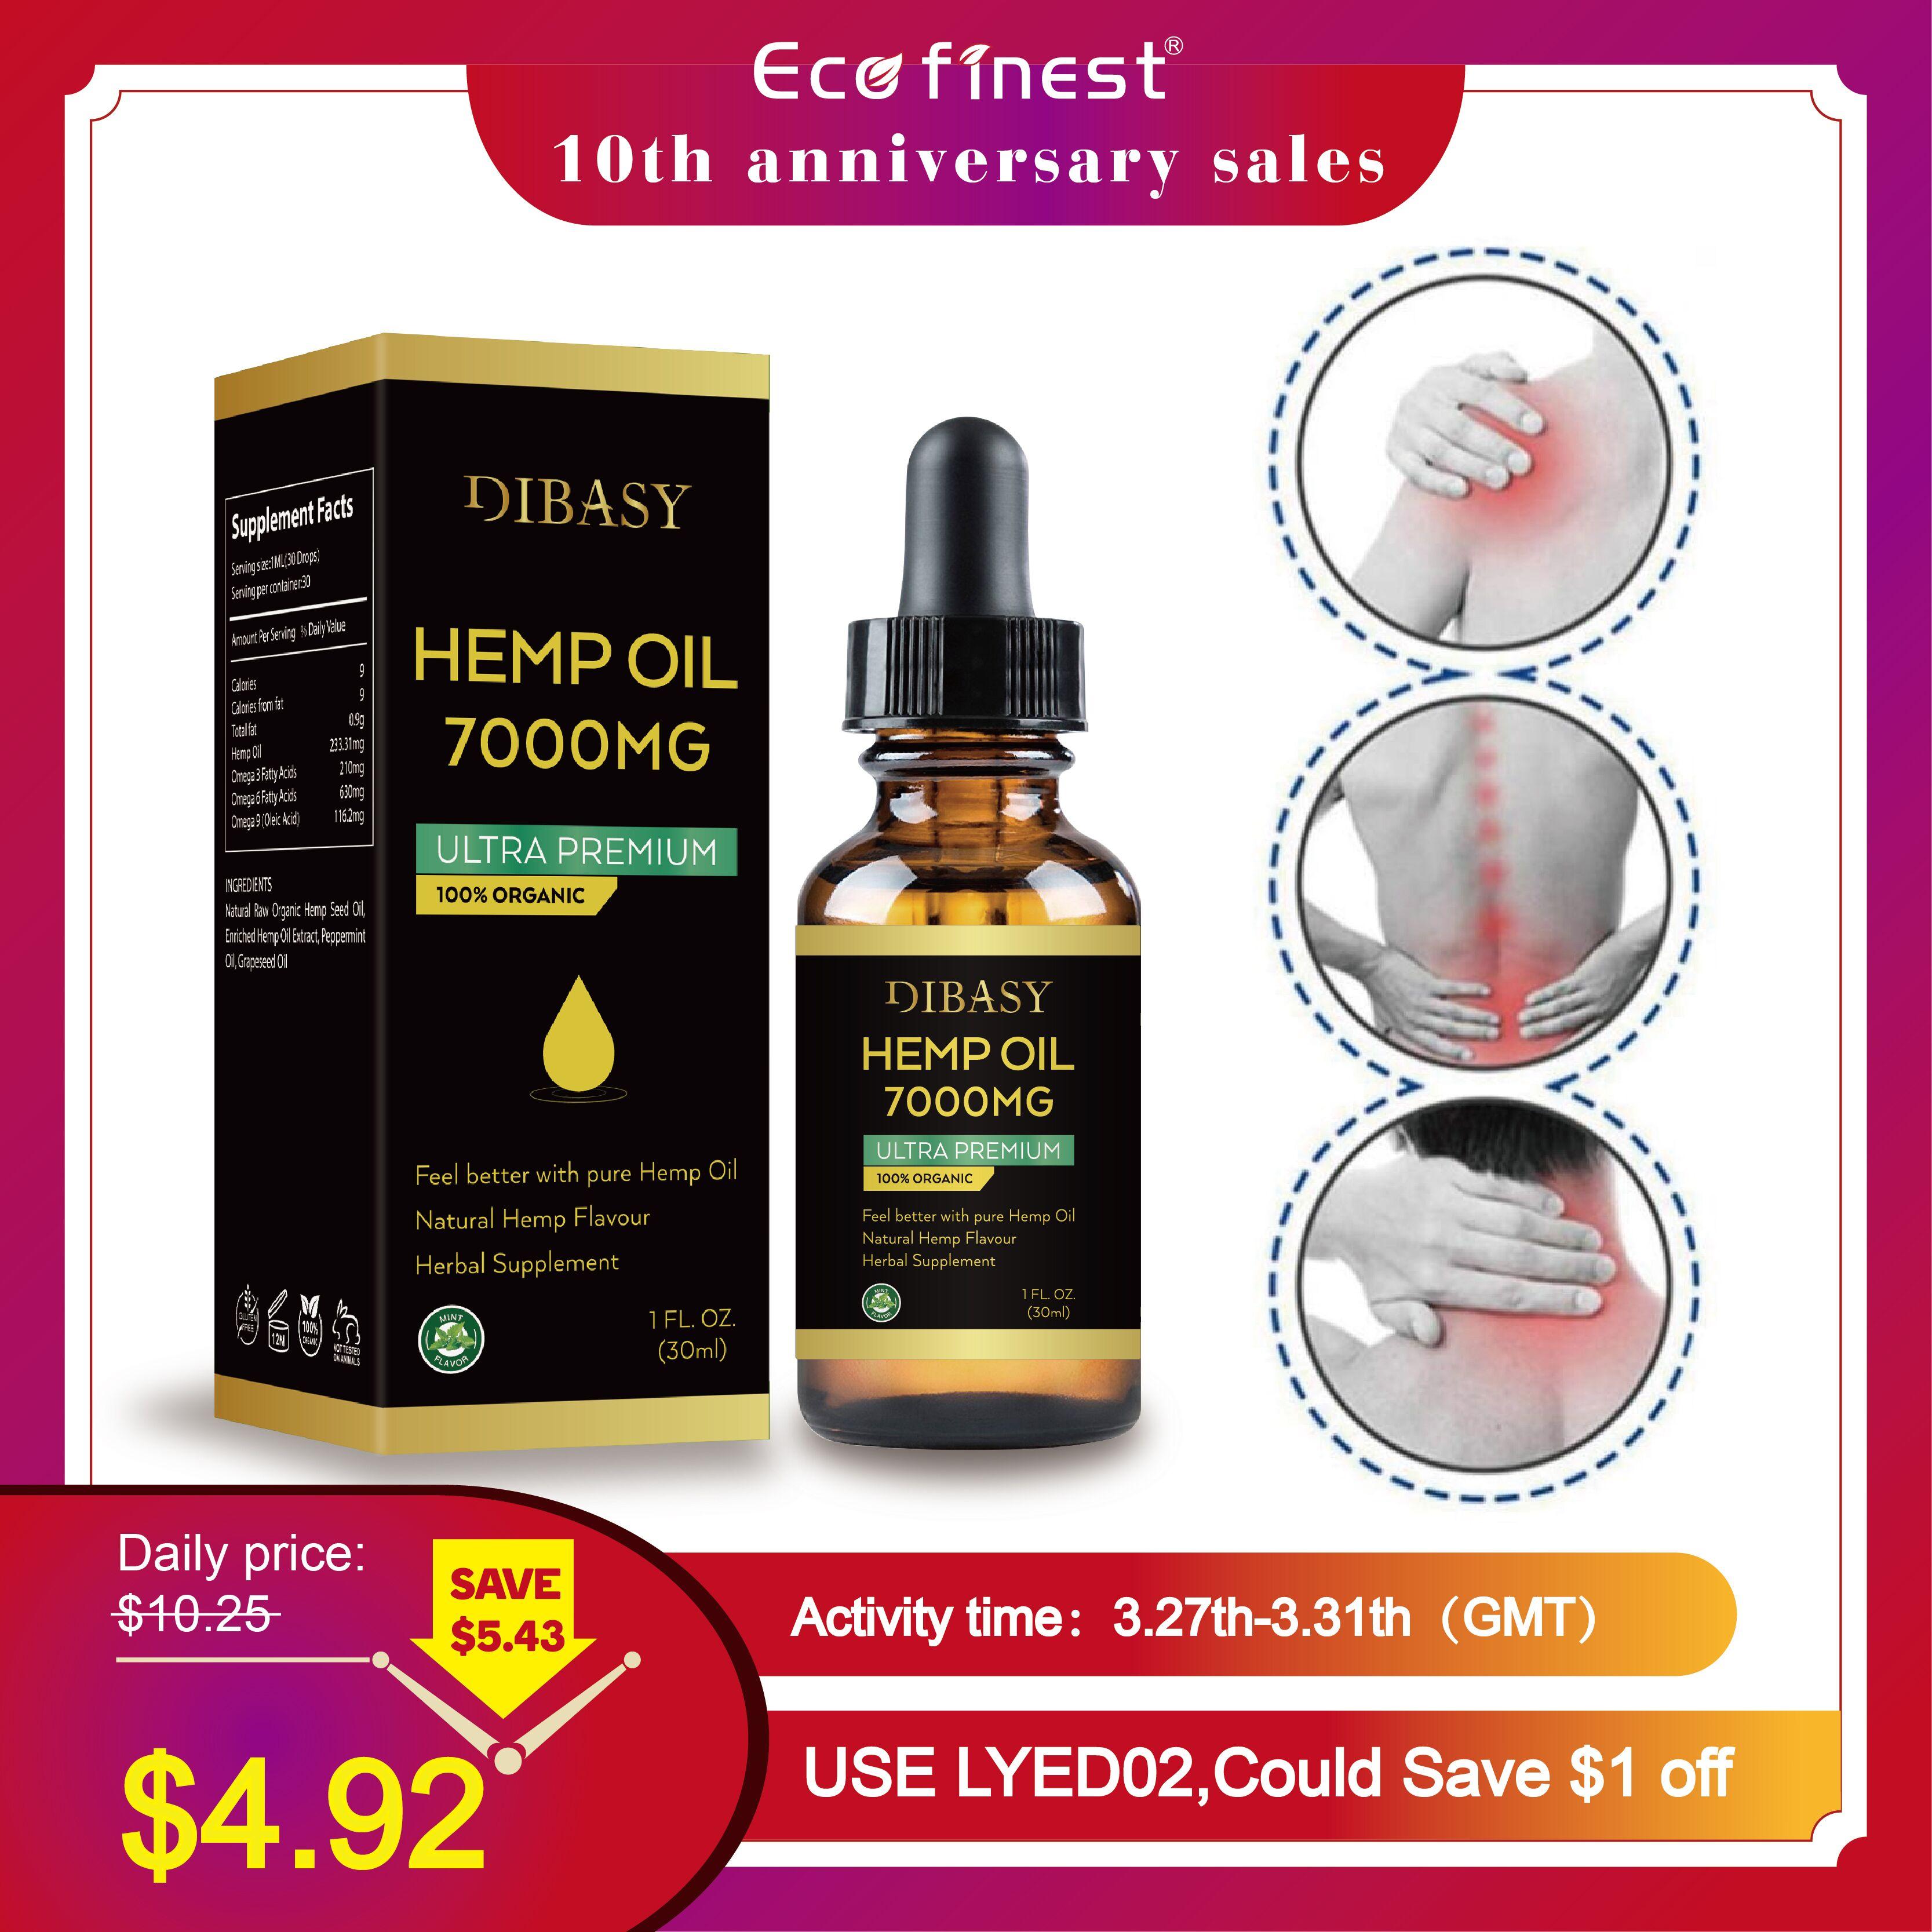 100% Natural Cbd 7000mg Essential Oil Aid Organic Hemp Seed Extract Hemp Oil Bio-active Drop Pain Relief Reduce Sleep Anxiety